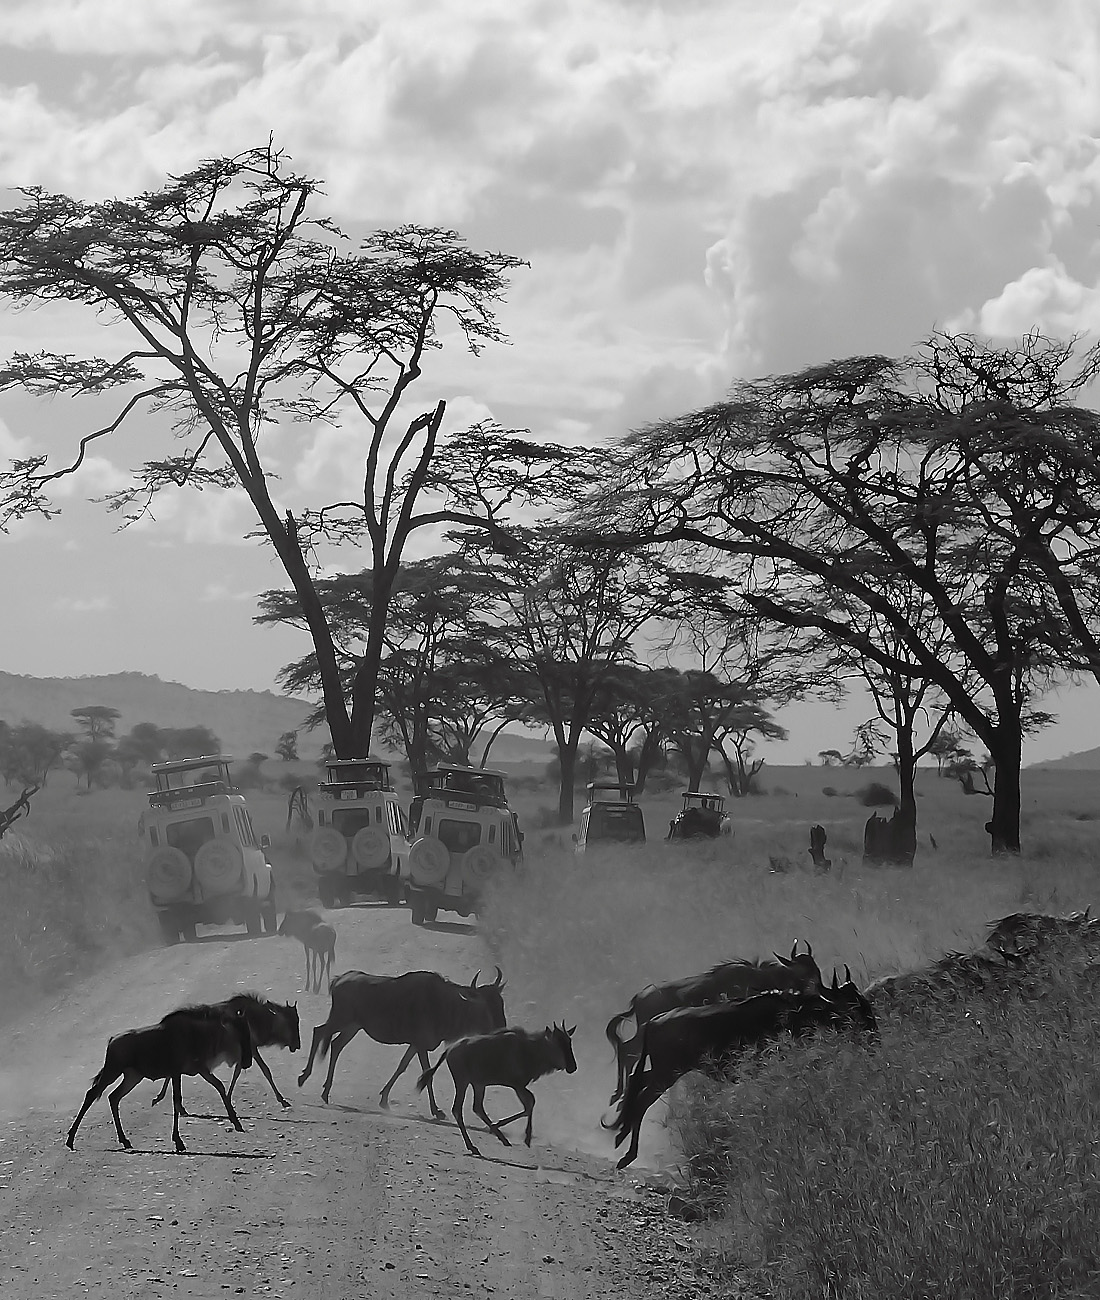 Serengeti wildebeest migration- Ultimate Wildlife Adventures